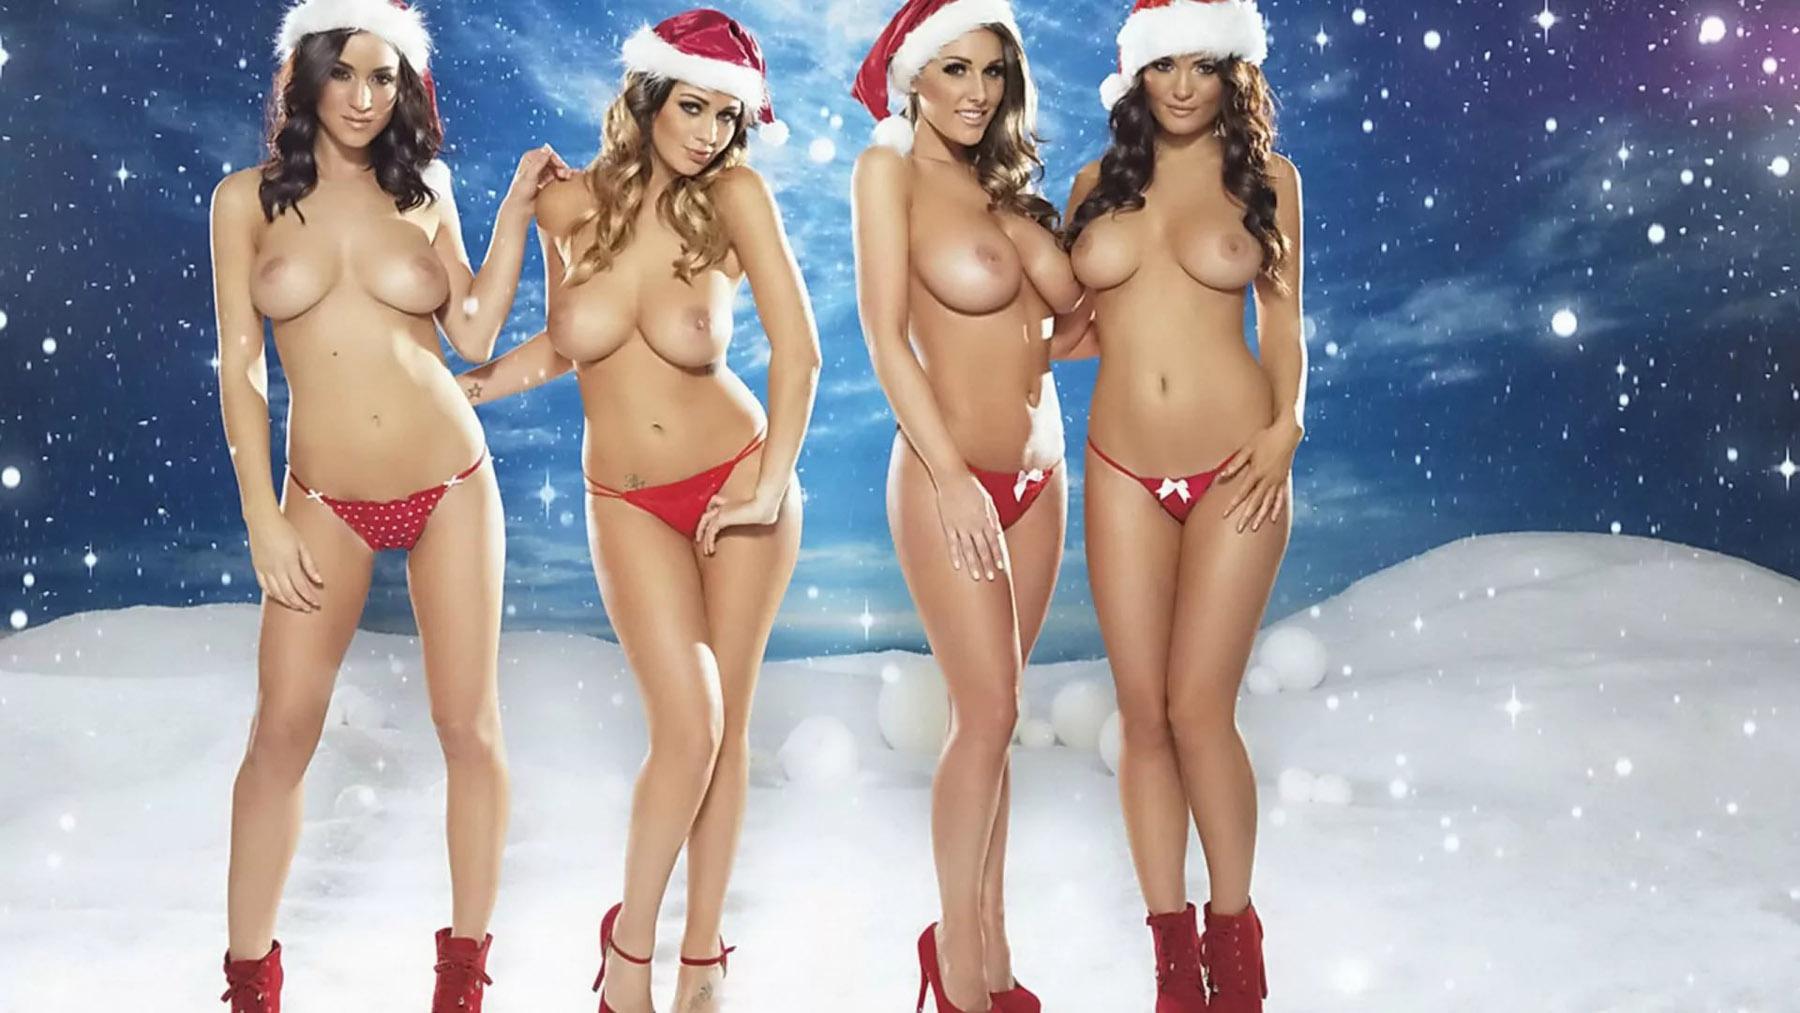 Sexy Christmas Santa Girls Nude